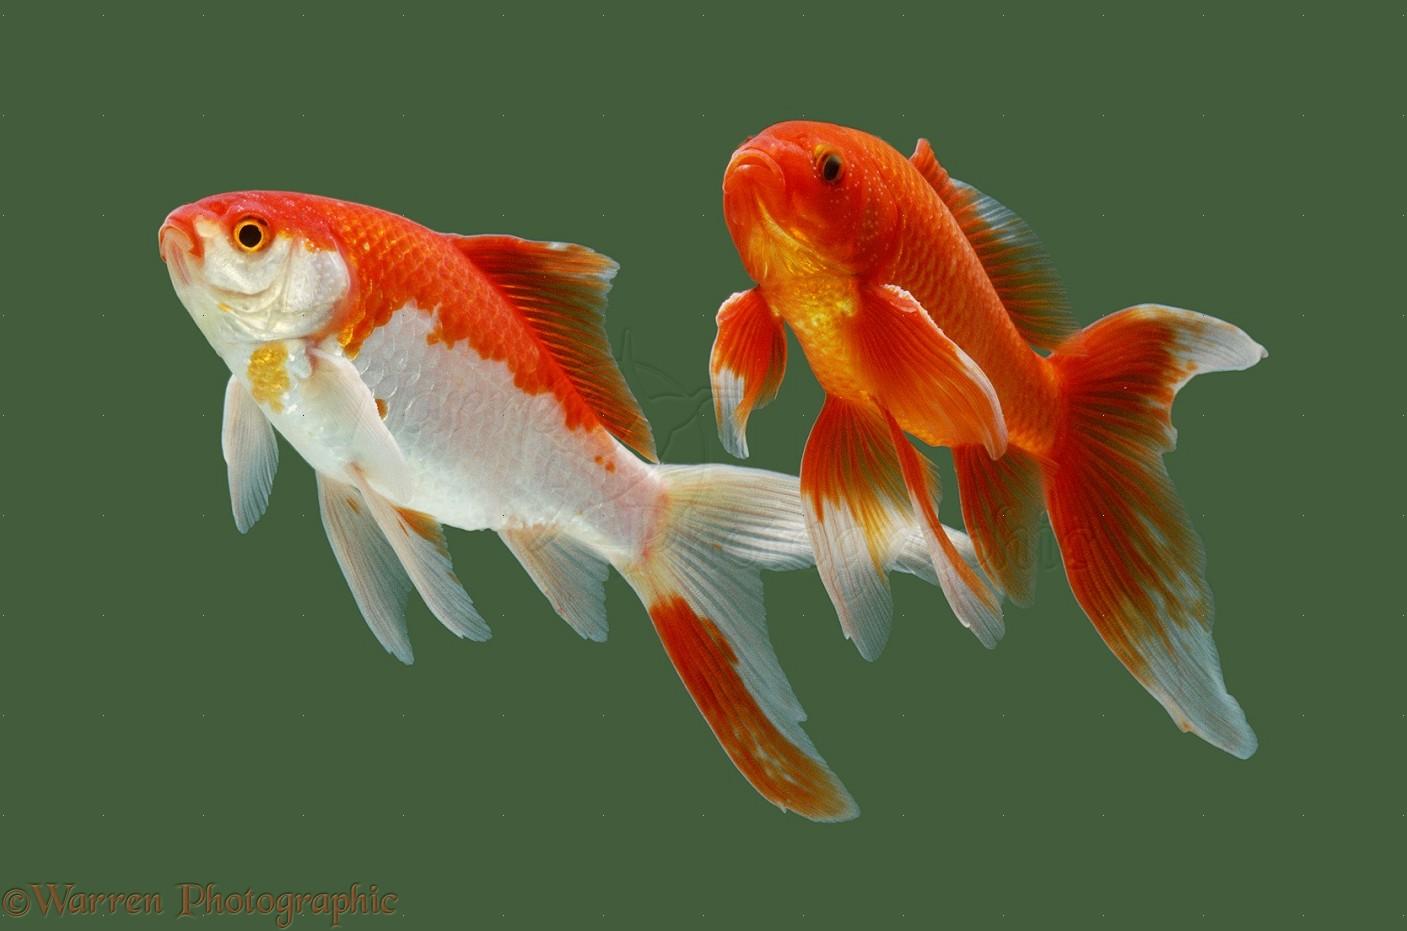 Goldfish photo wp15340 for Koi fish habitat